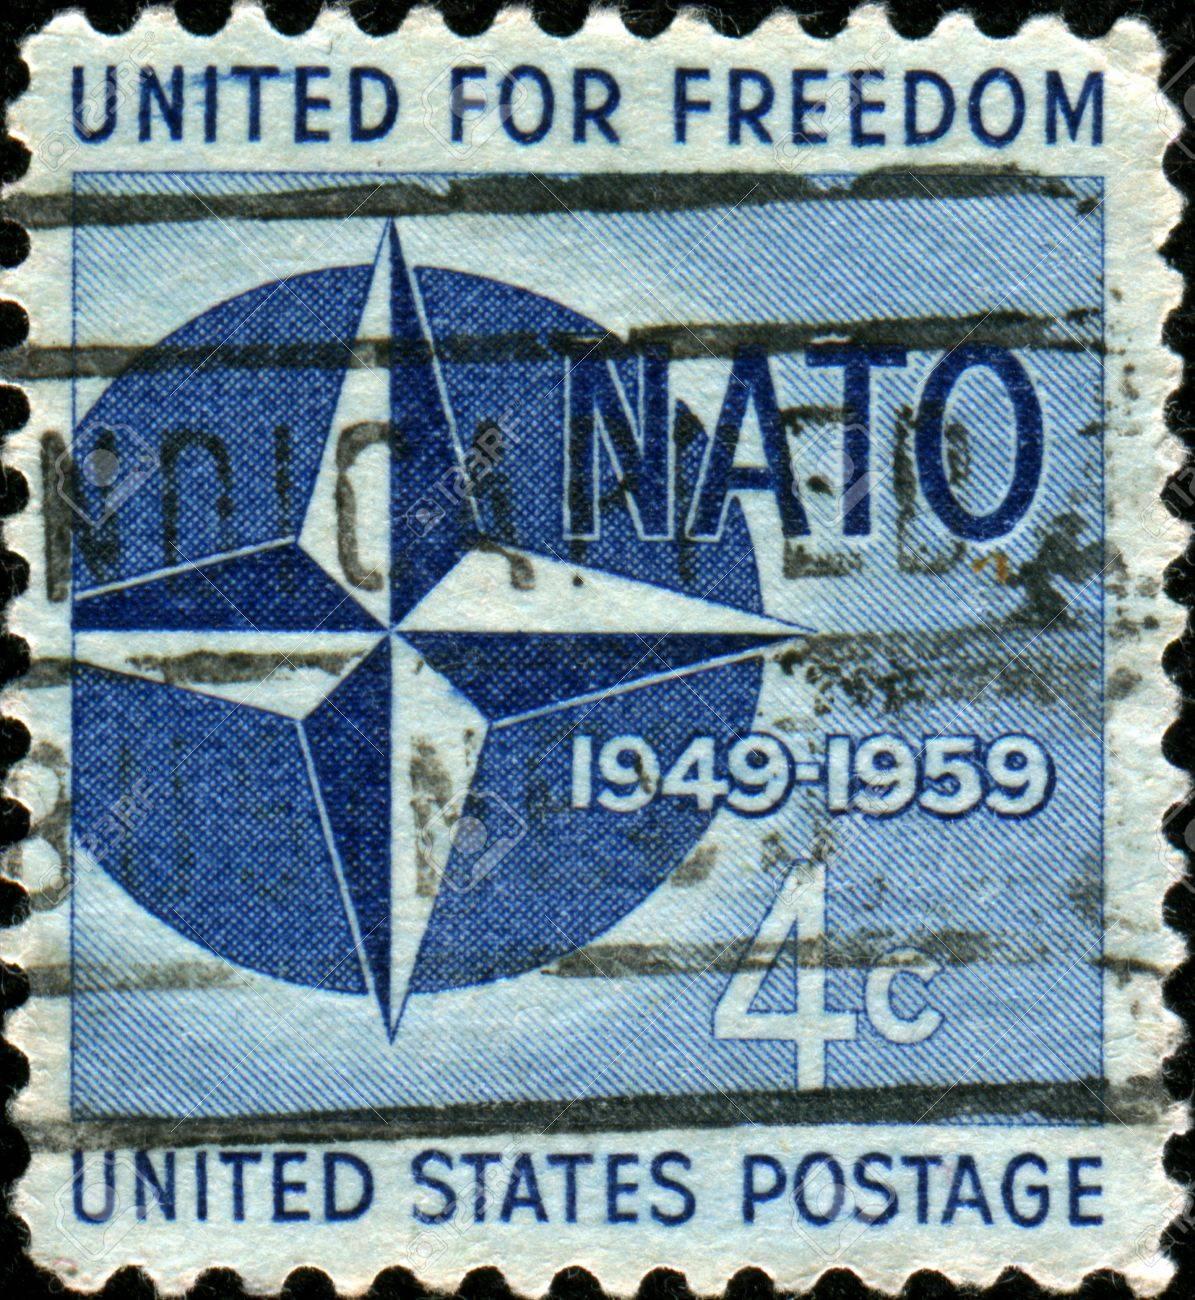 UNITED STATES OF AMERICA - CIRCA 1959: A stamp printed in the United States of America shows NATO Emblem, 10th anniversary of North Atlantic Treaty Organization, circa 1959  Stock Photo - 17269813